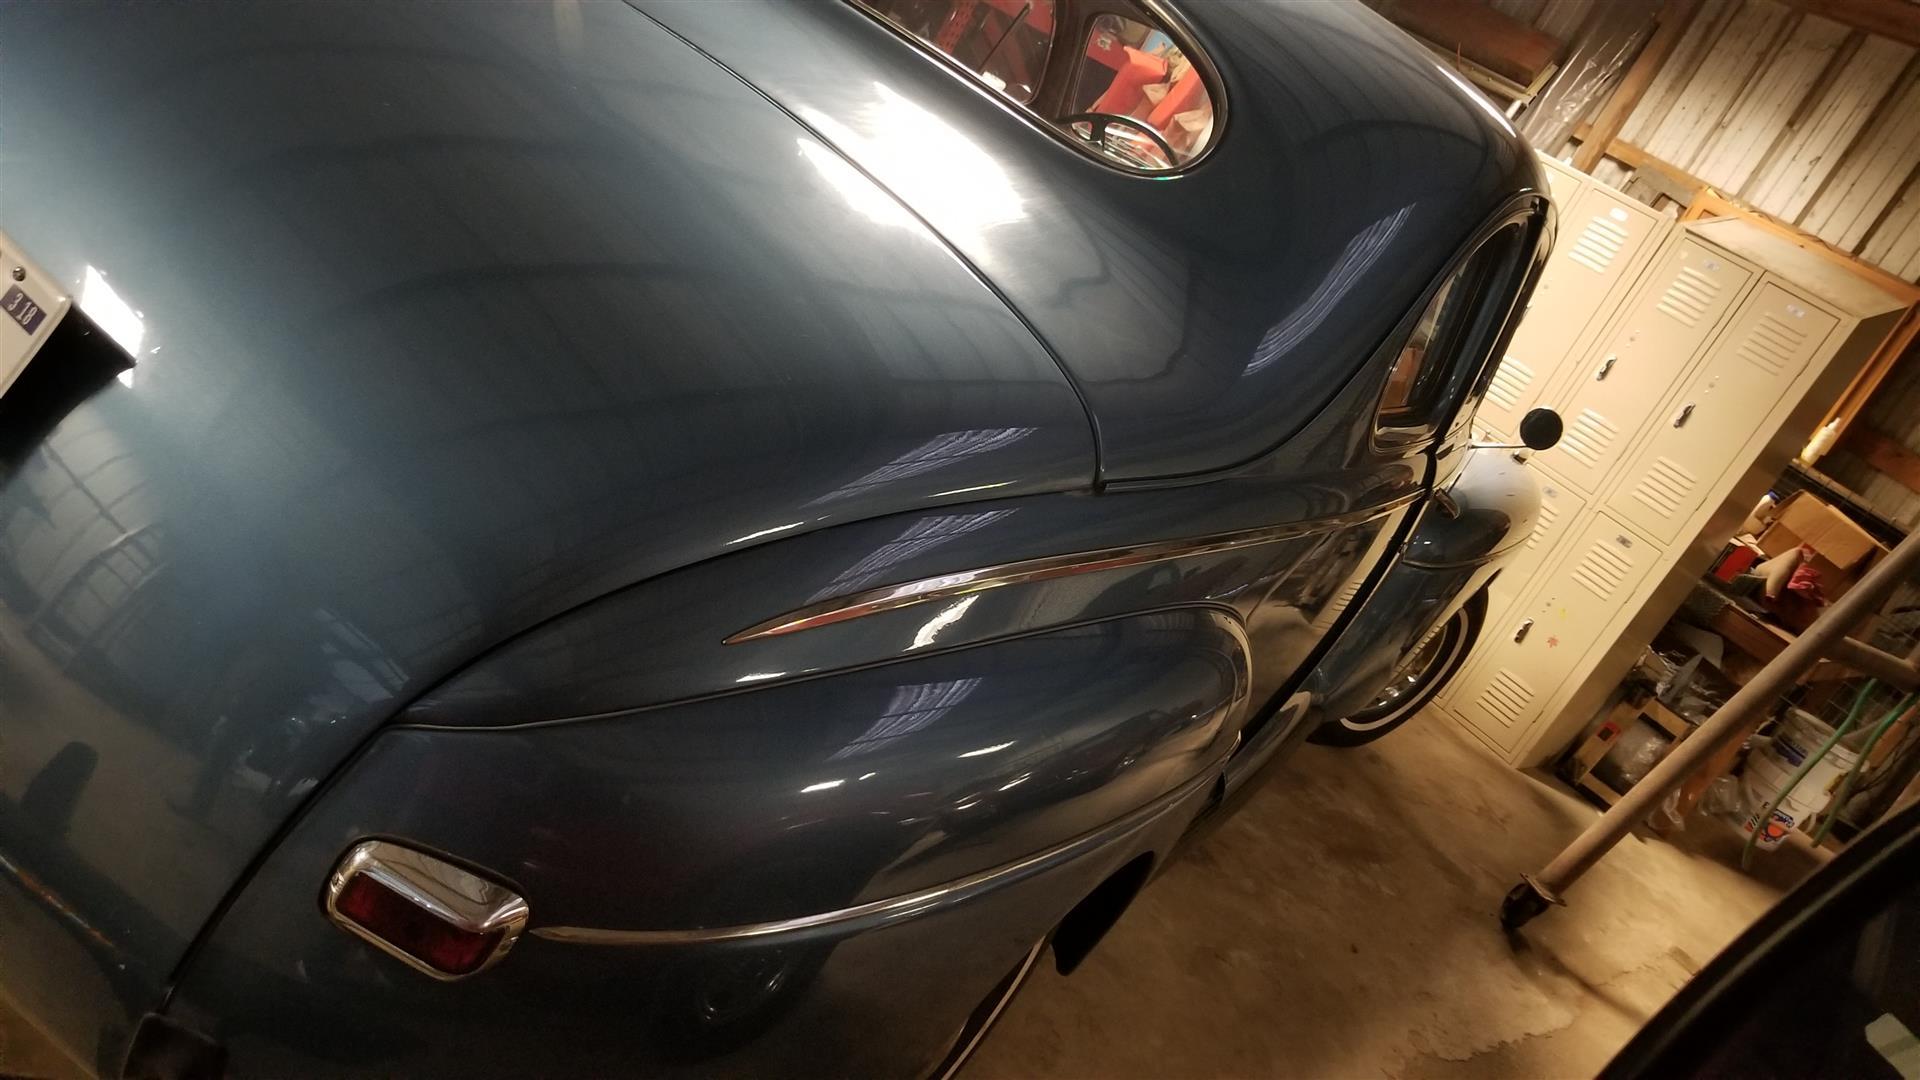 1941 Mercury Coupe Flathead V8 Ford 9 Rear End Factory A C 4 Door Sedan Drives Great